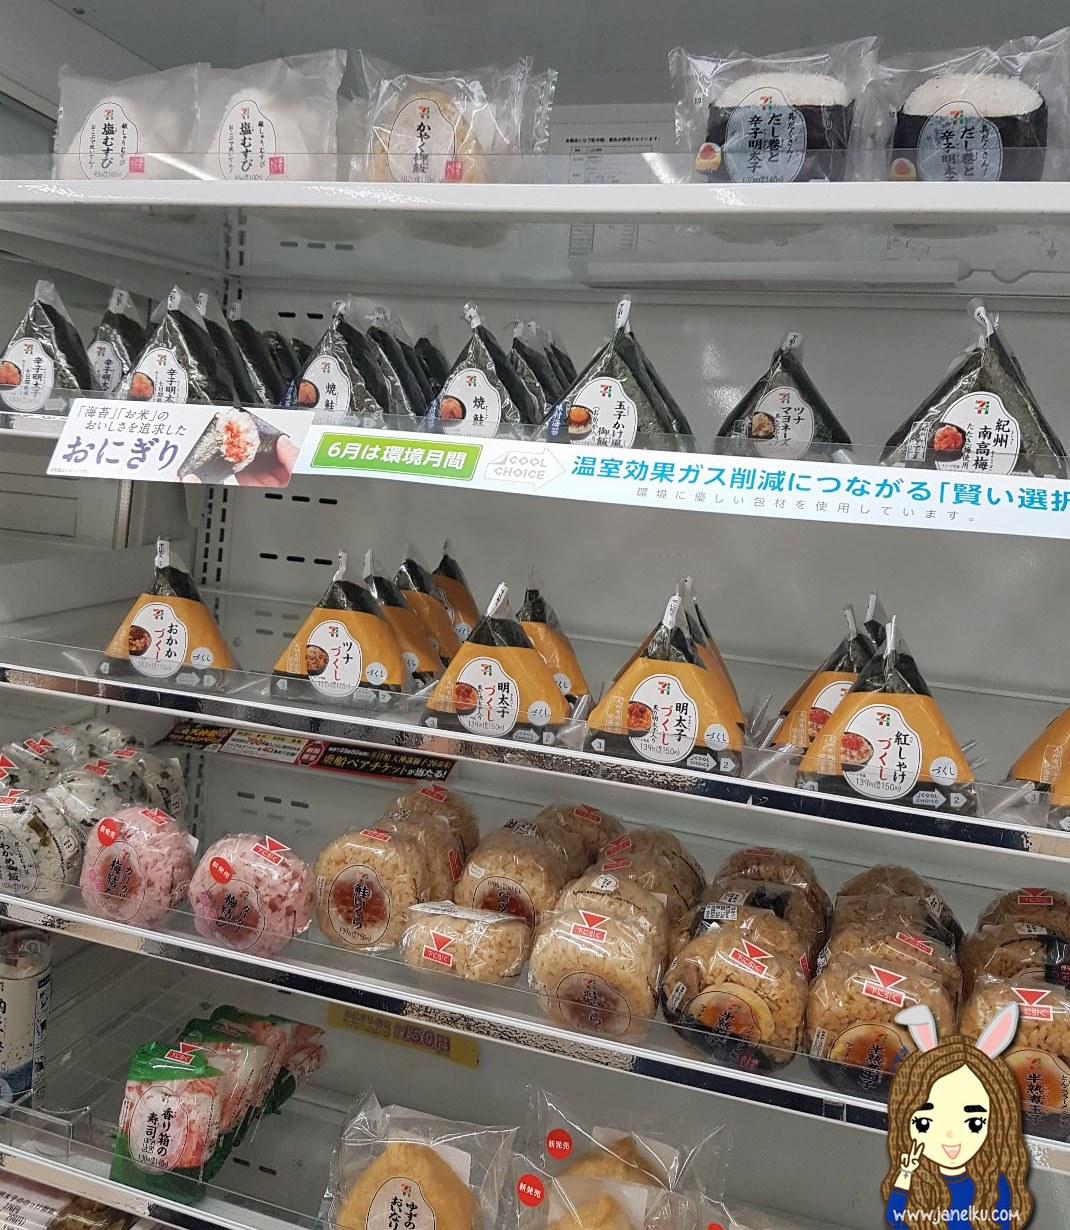 Food display of 7-11 convenience store in Japan